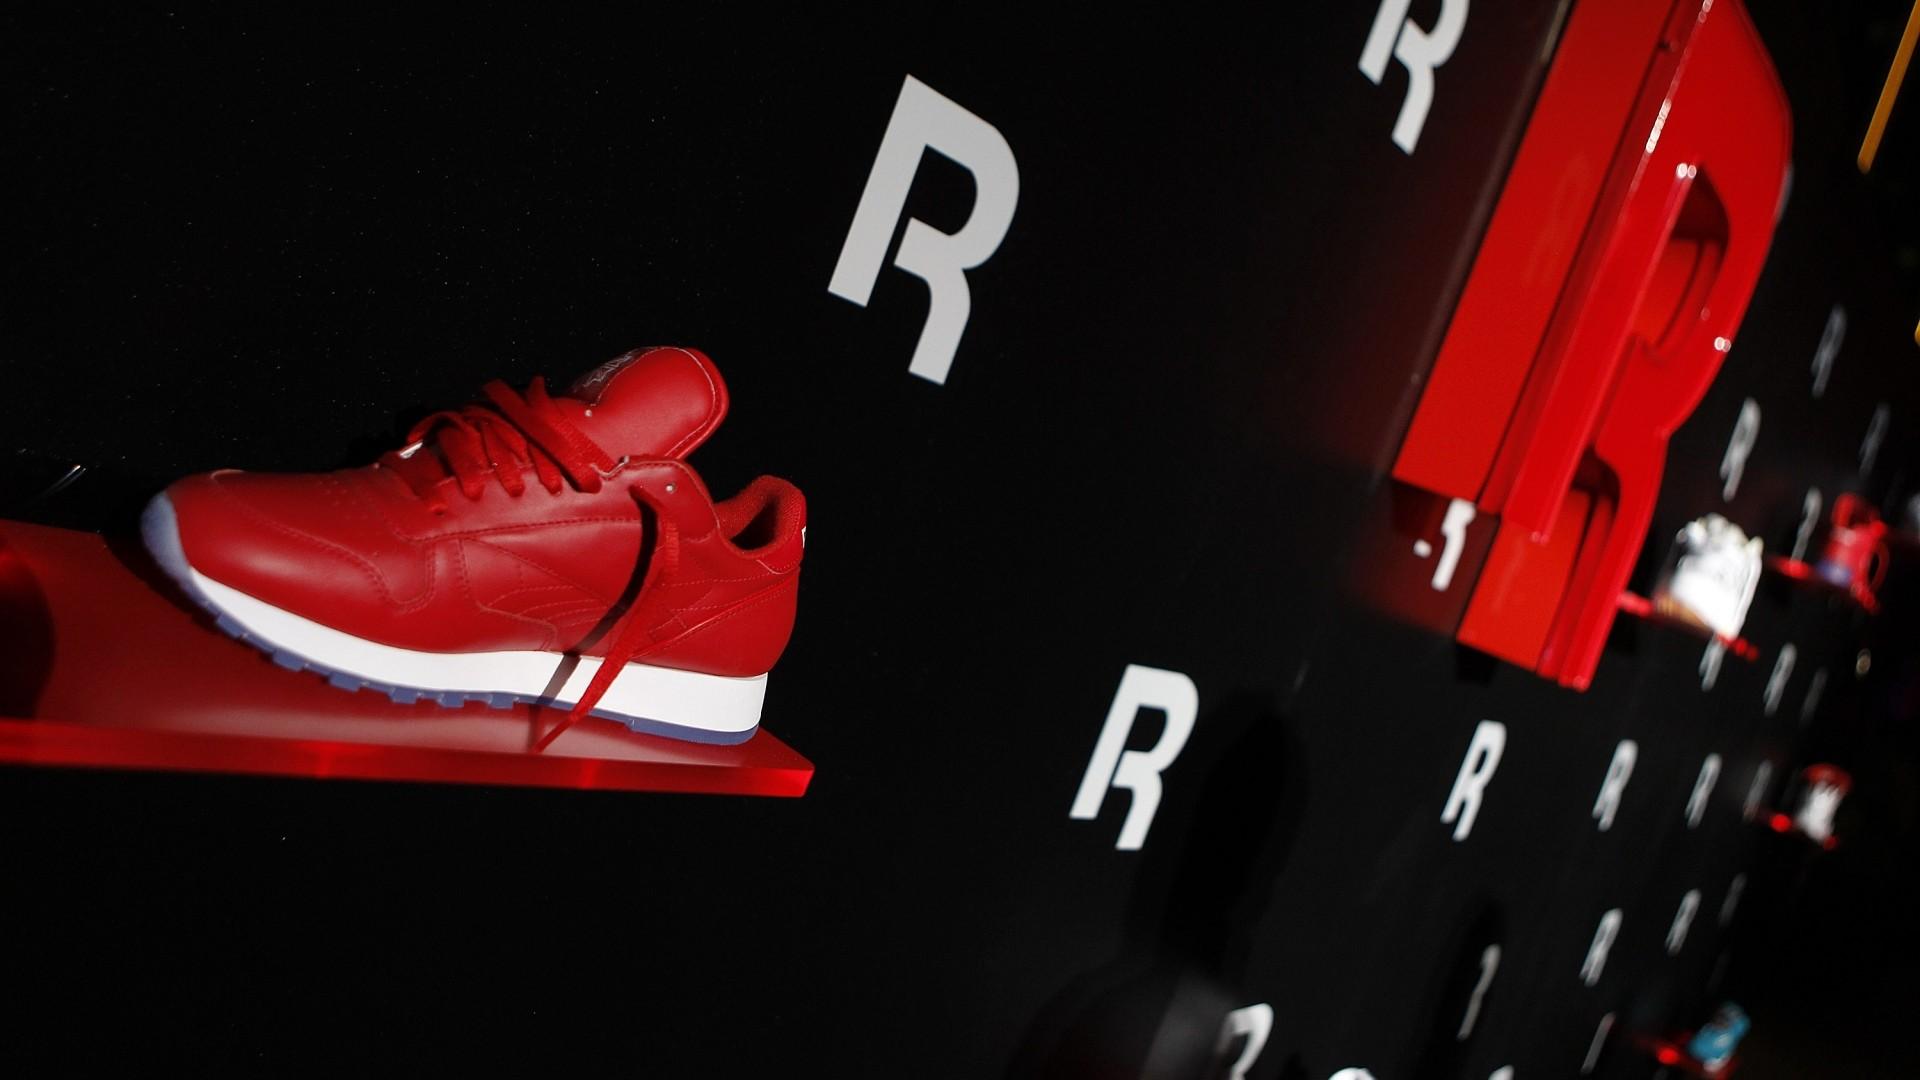 1920x1200 Download Free Air Jordan Shoes Wallpapers | HD Wallpapers .